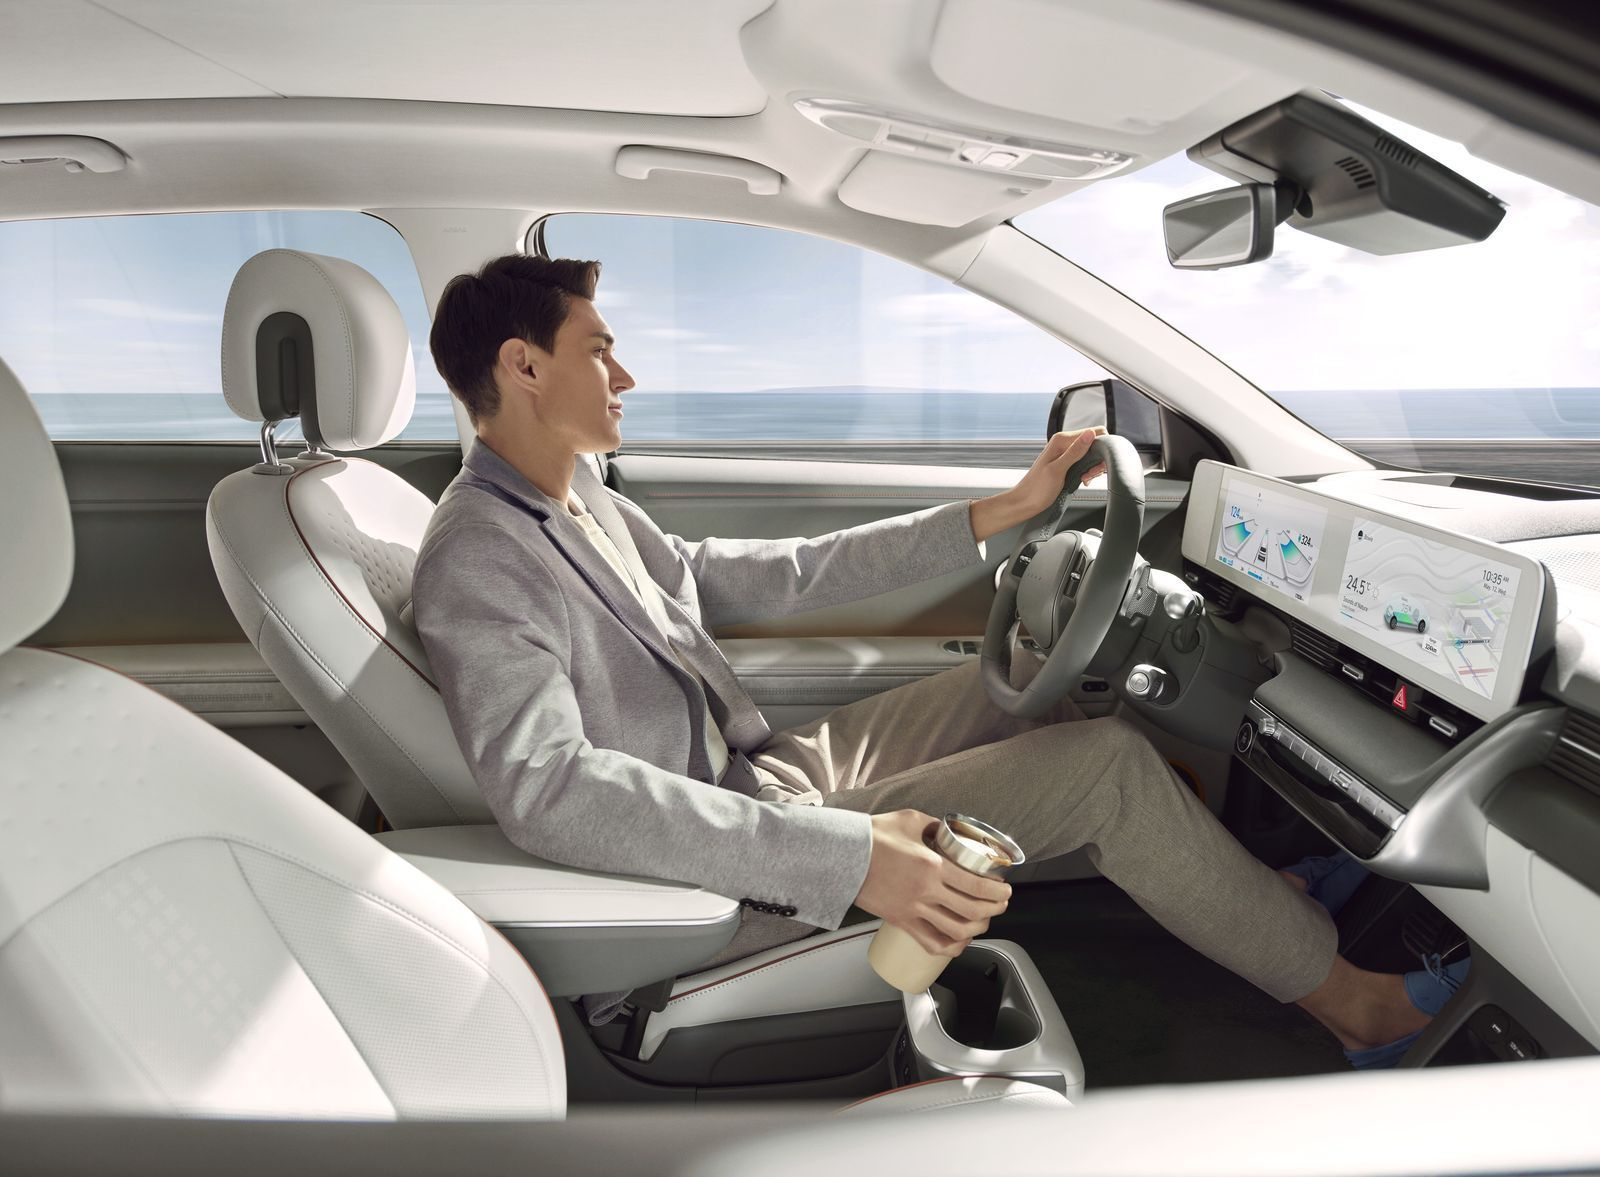 011_IONIQ_Lifestyle_DrivingMode